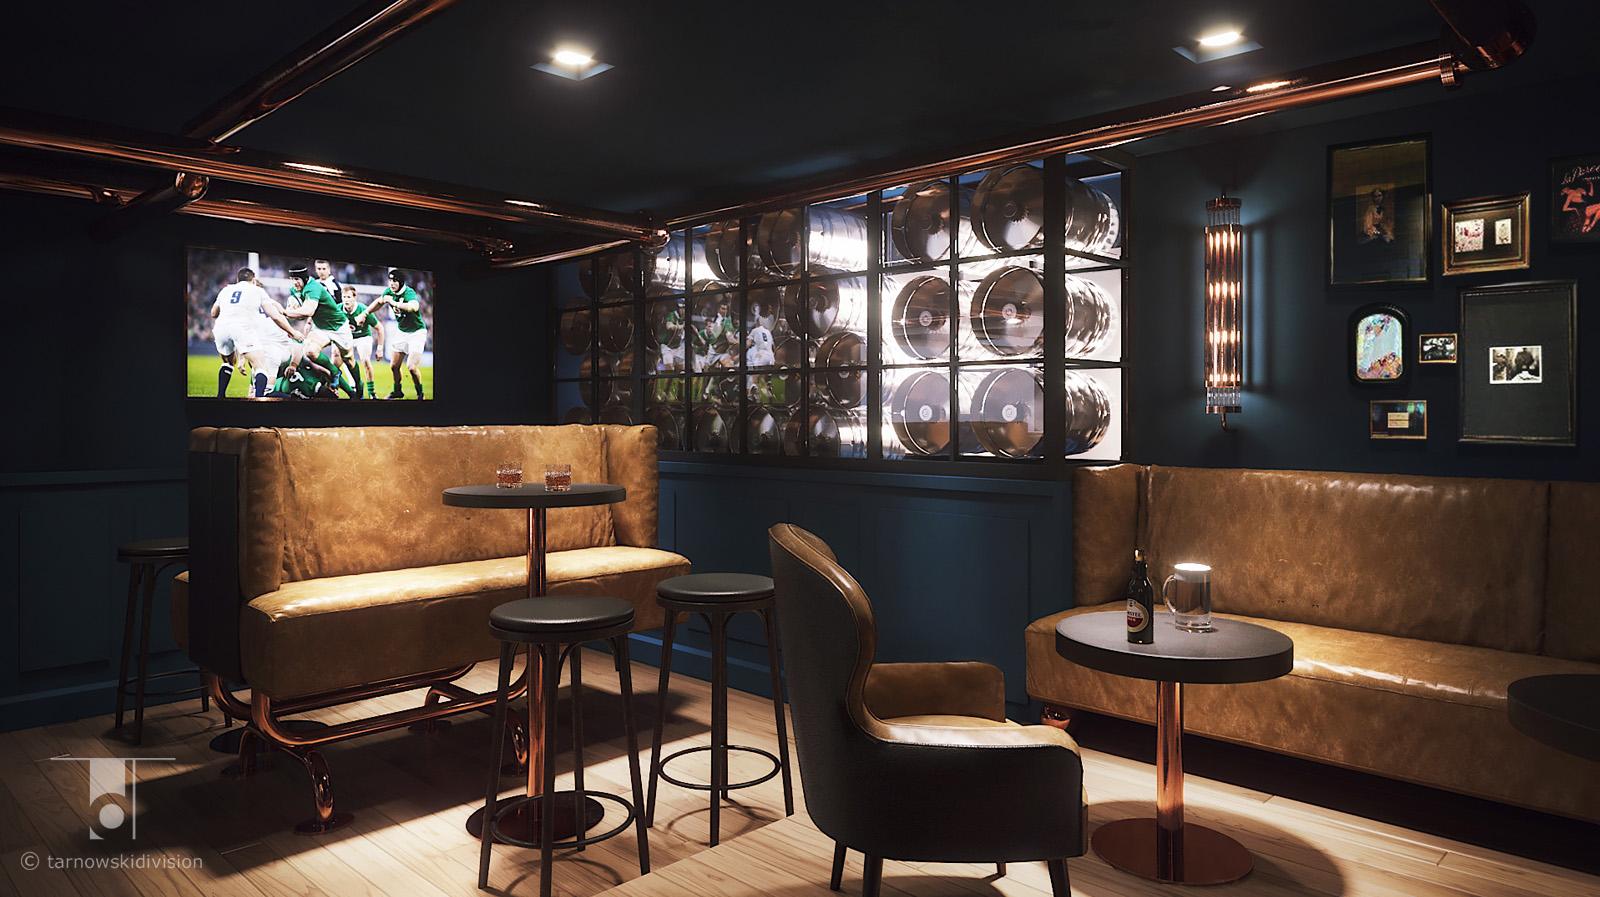 wnętrze restauracji pub Hop House Hotel Hilton Praga restauracja projekt wnętrz restaurant interior design_tarnowskidivision